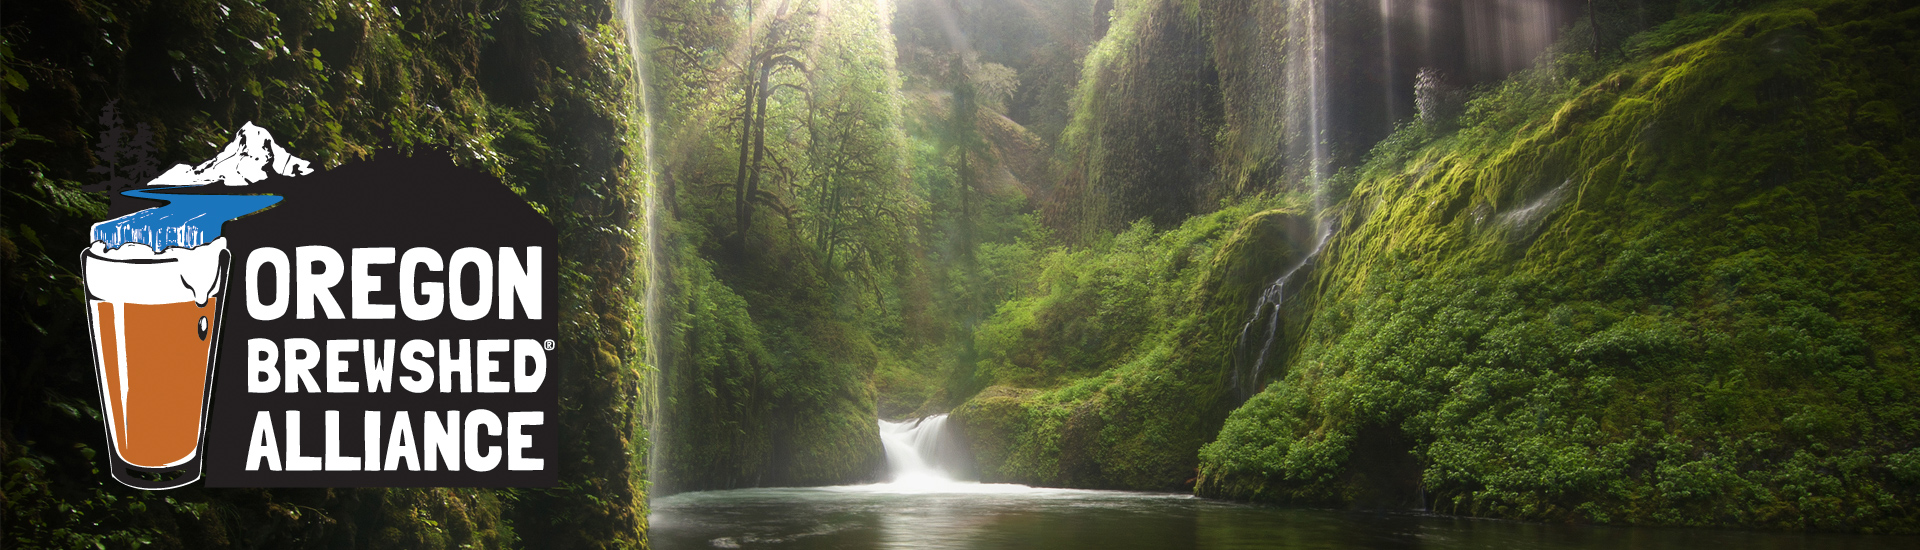 Oregon Brewshed® Alliance (Eagle Creek photo by Jamey Pyles)